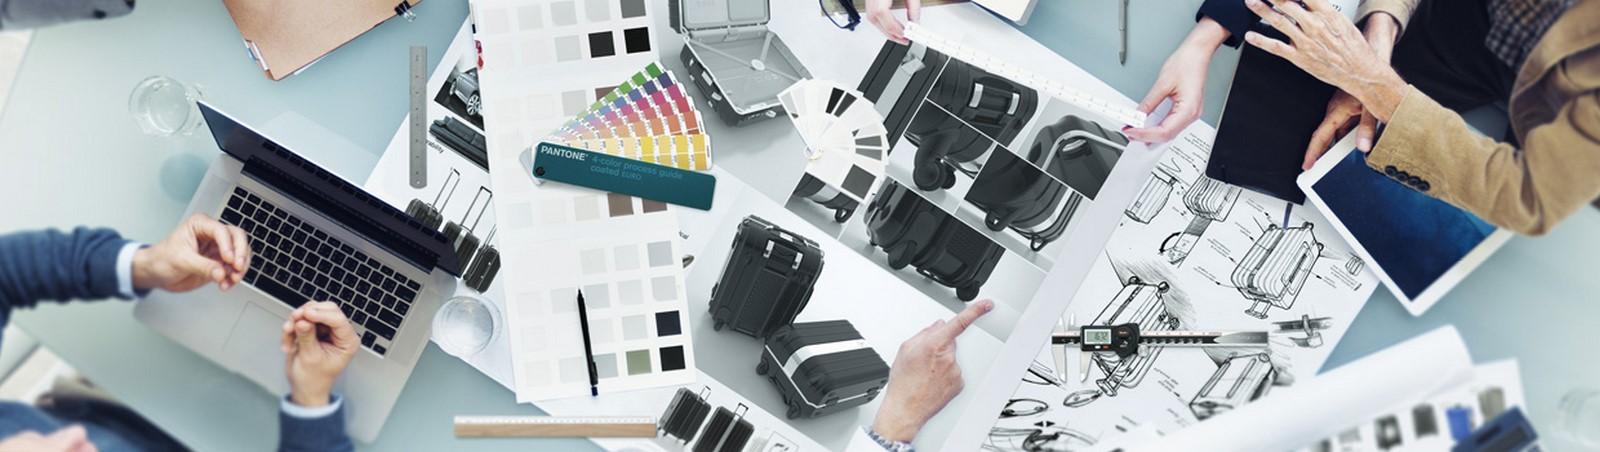 Sequoia-studio- 10 Iconic Products - Sheet1